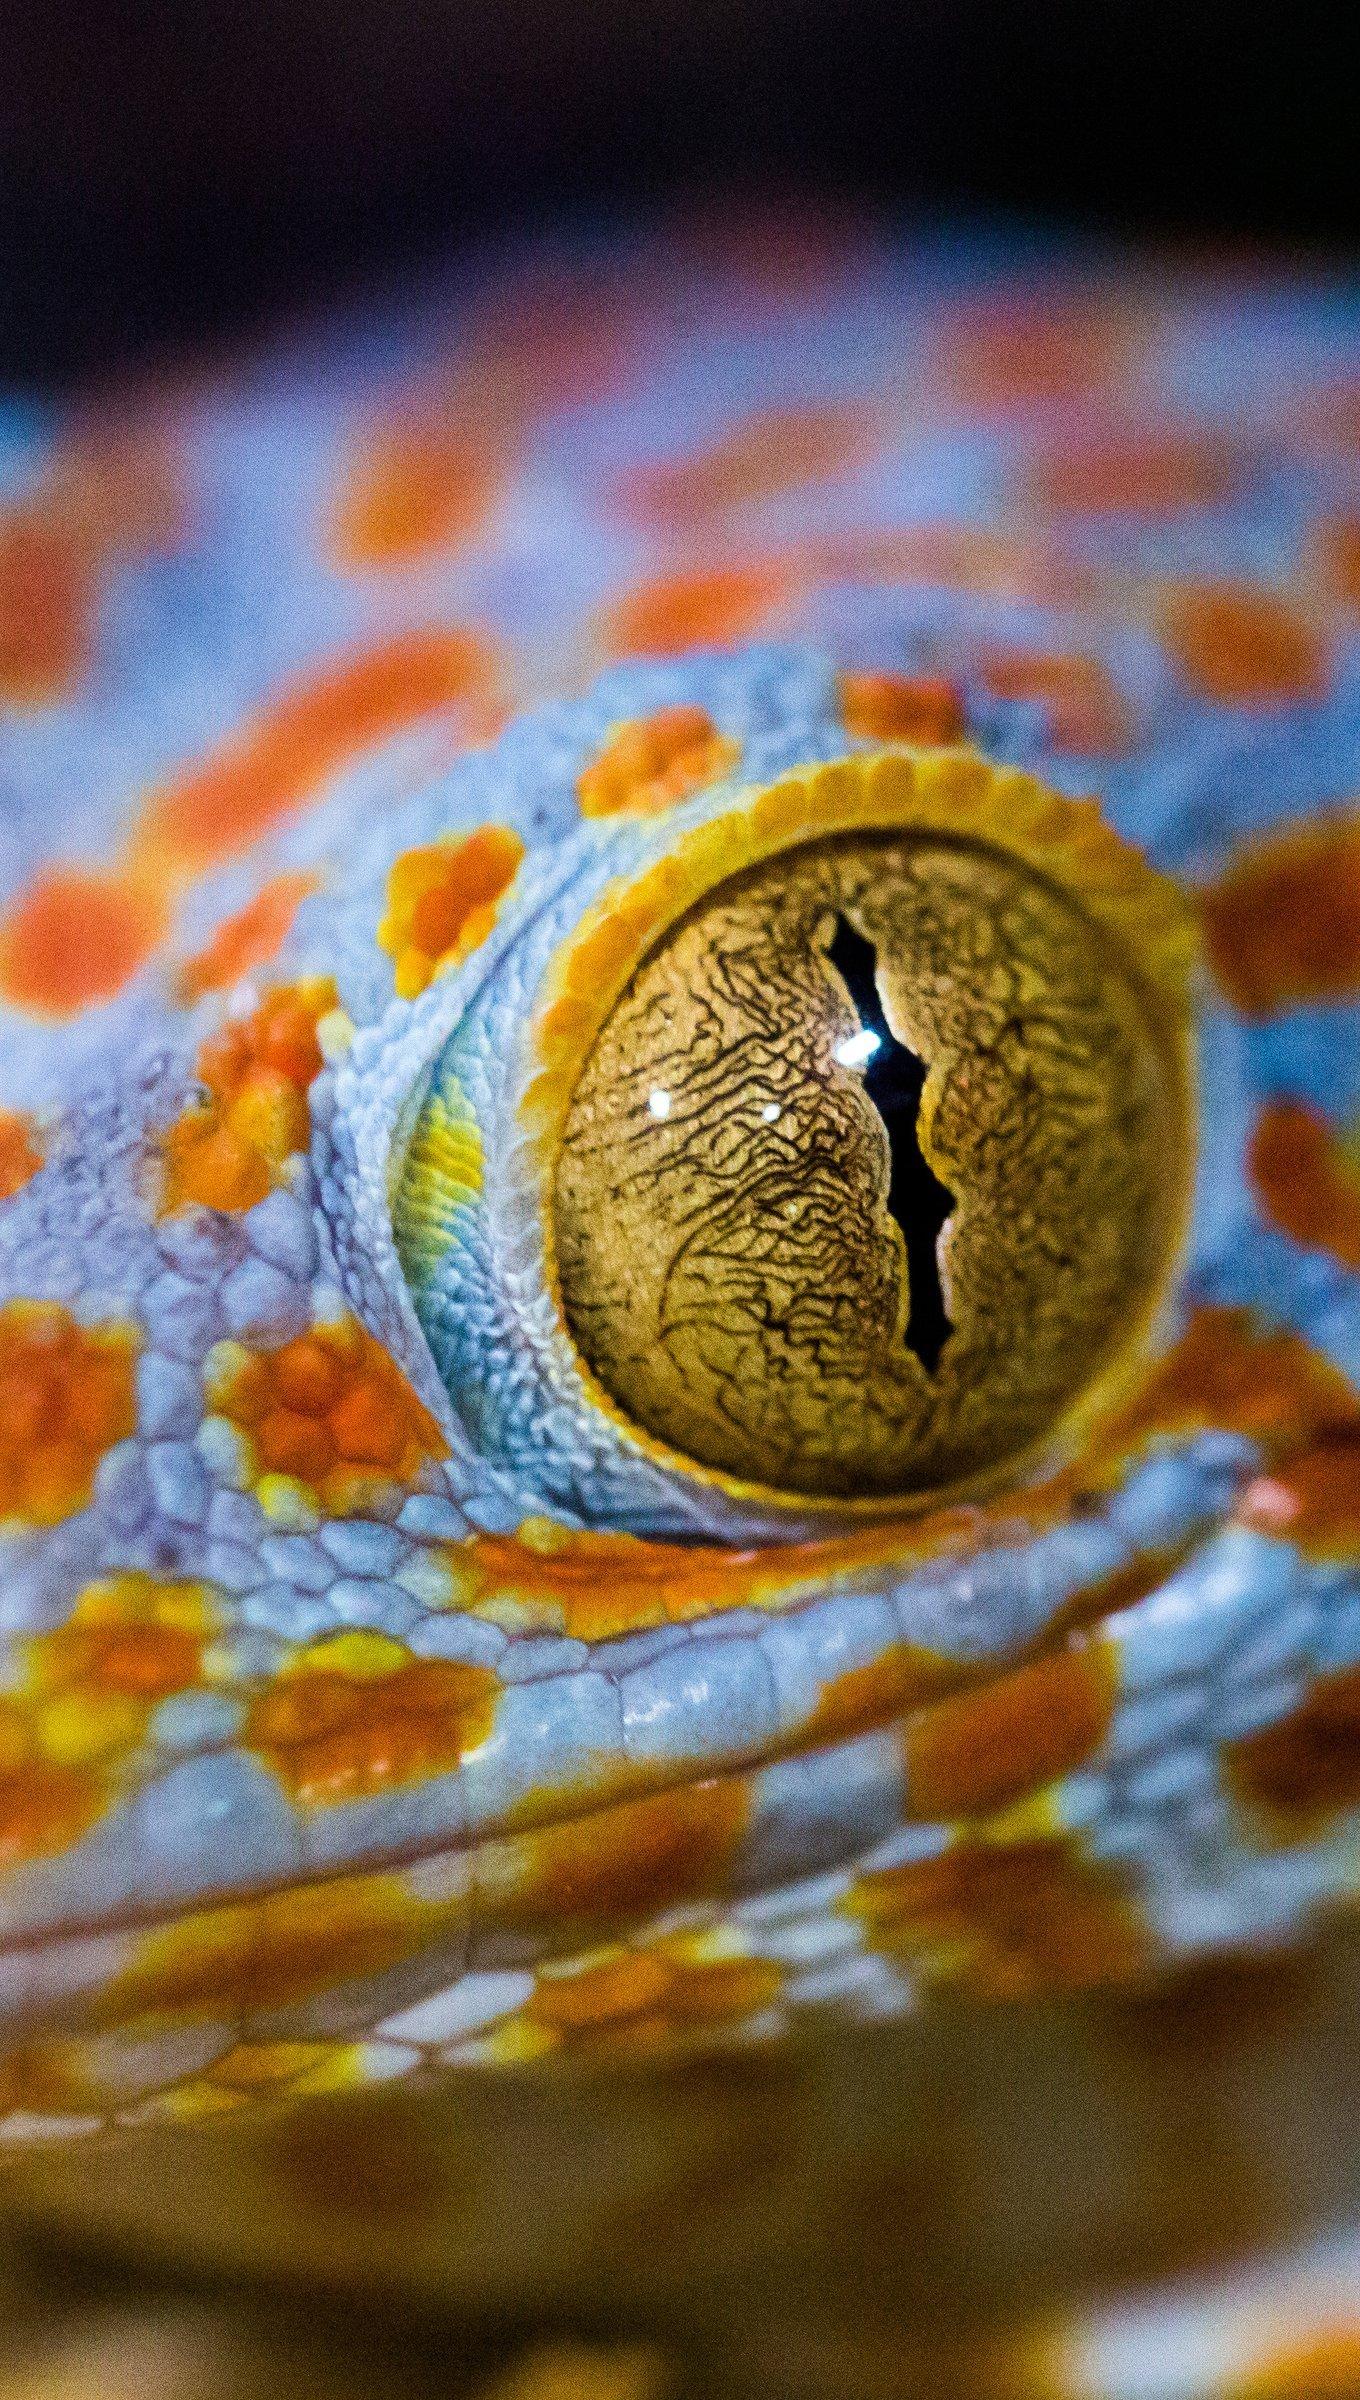 Fondos de pantalla El ojo de lagartija Vertical